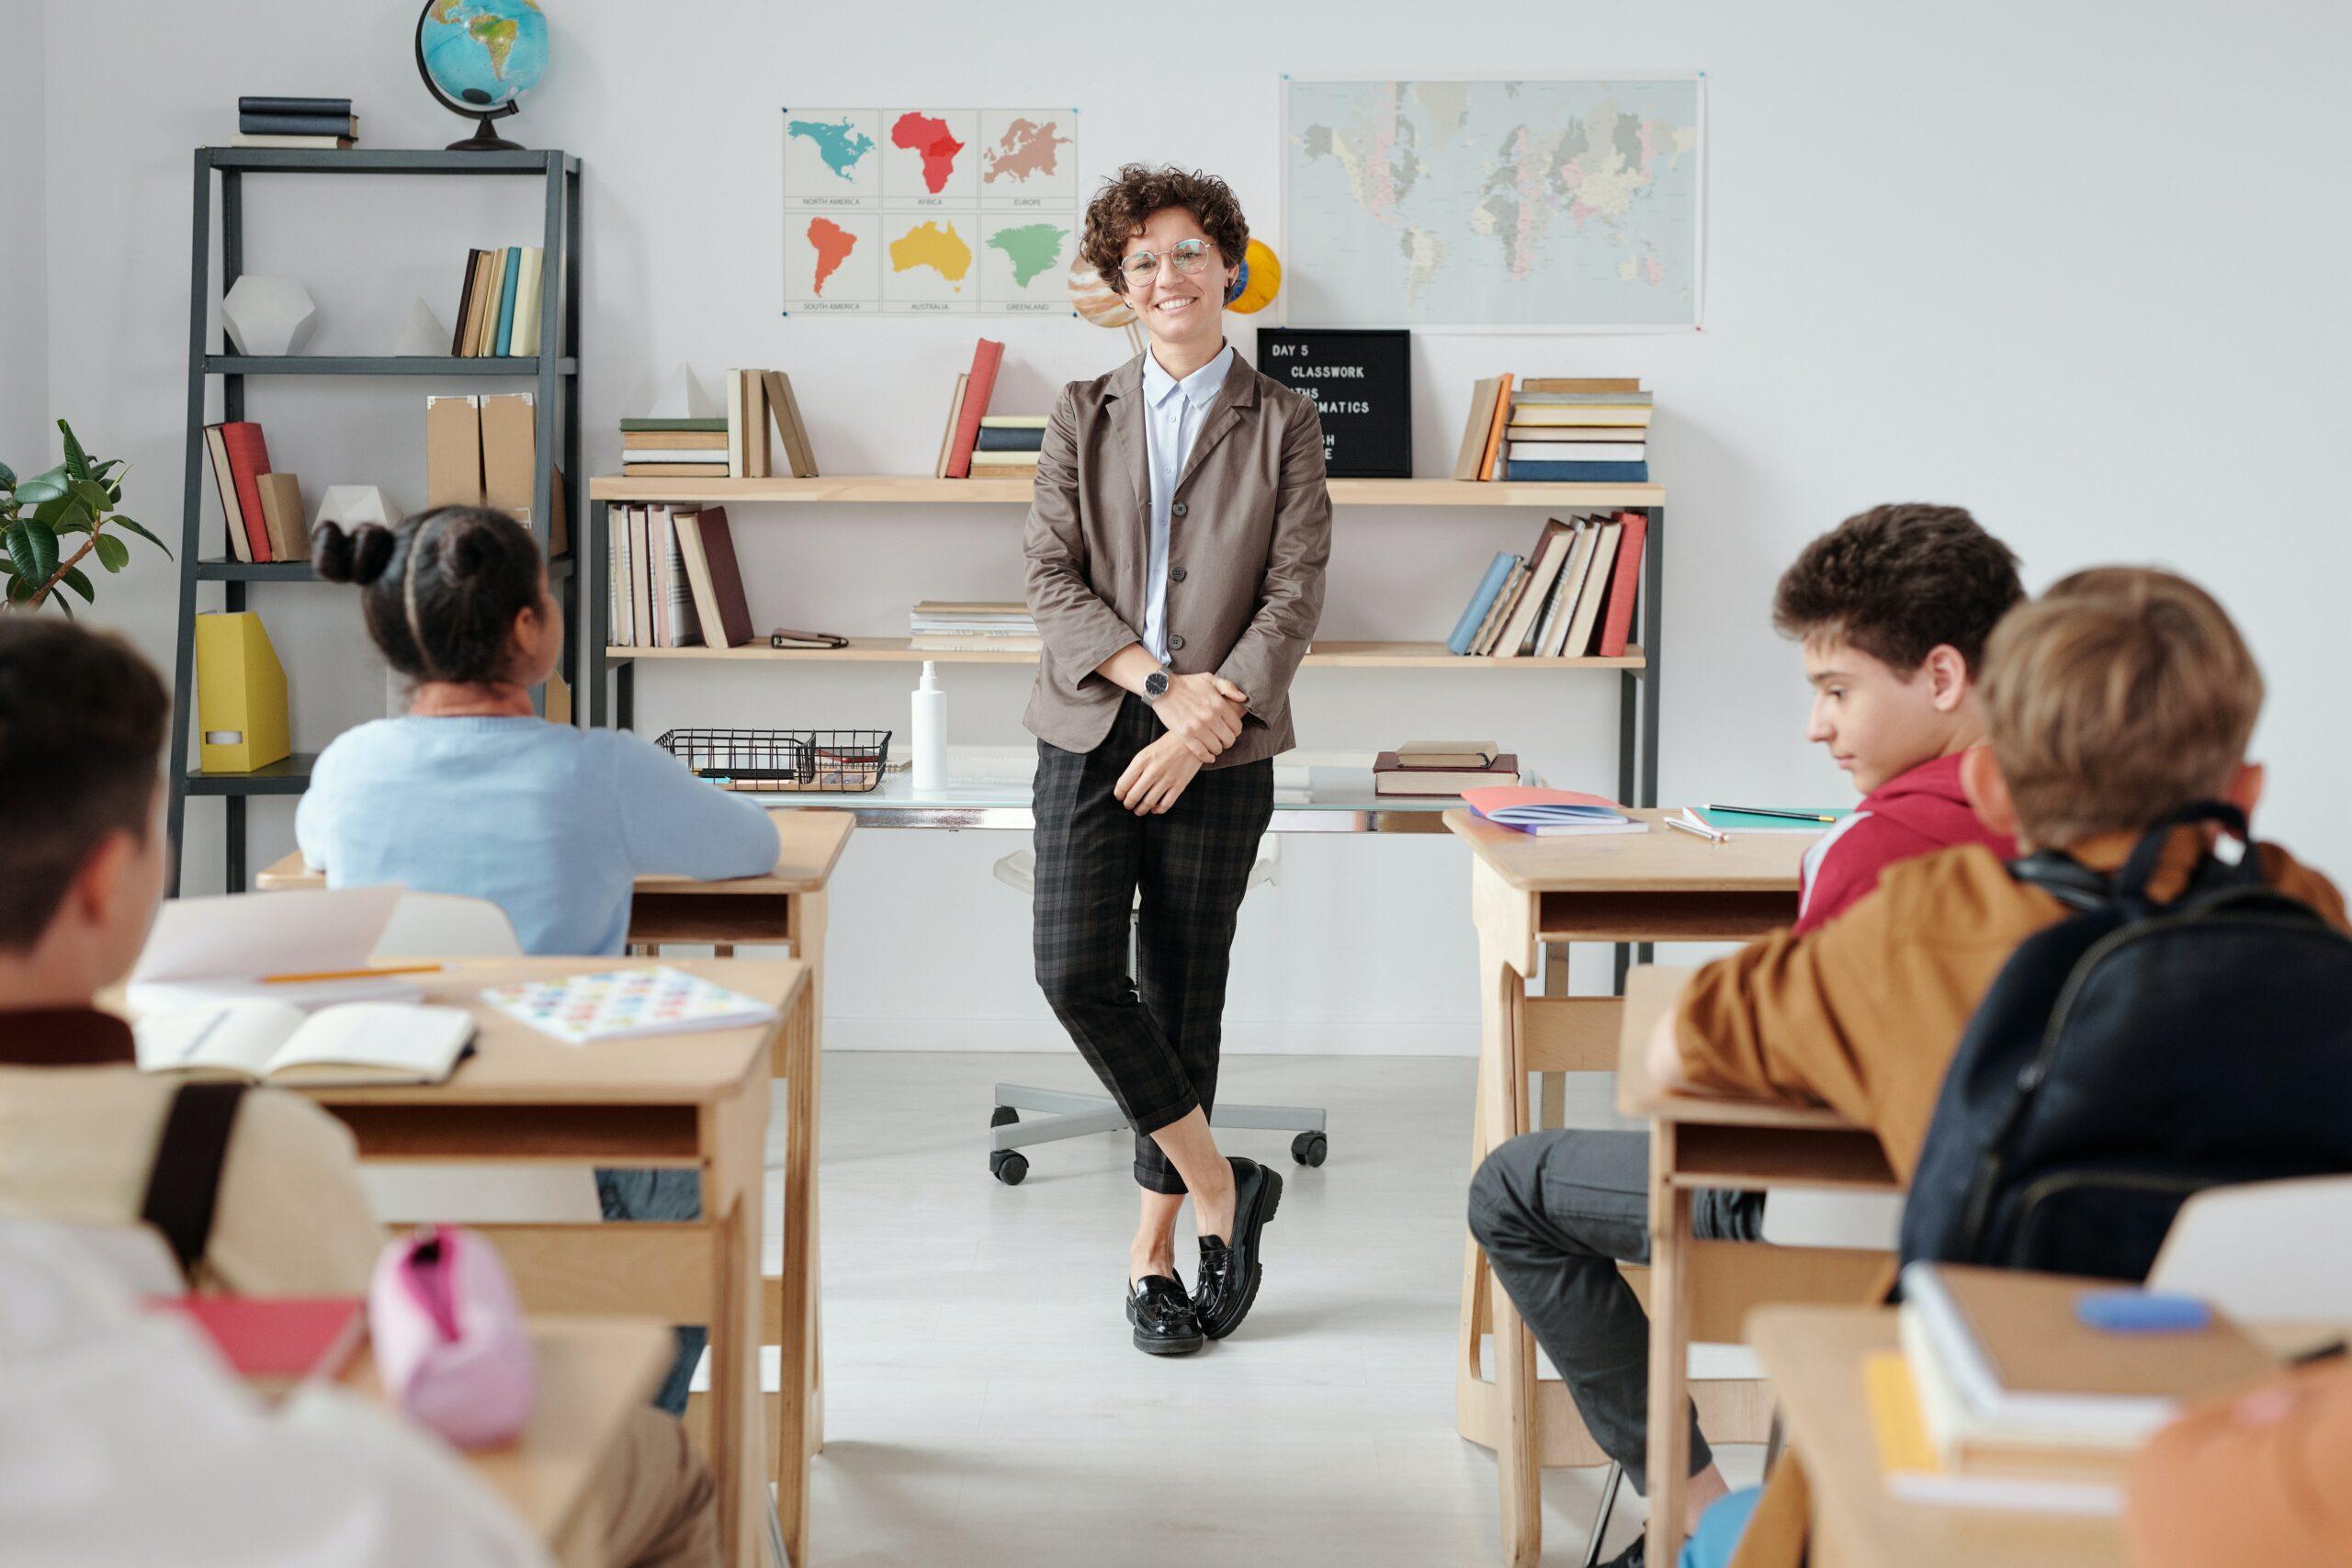 a teacher standing in front of her class